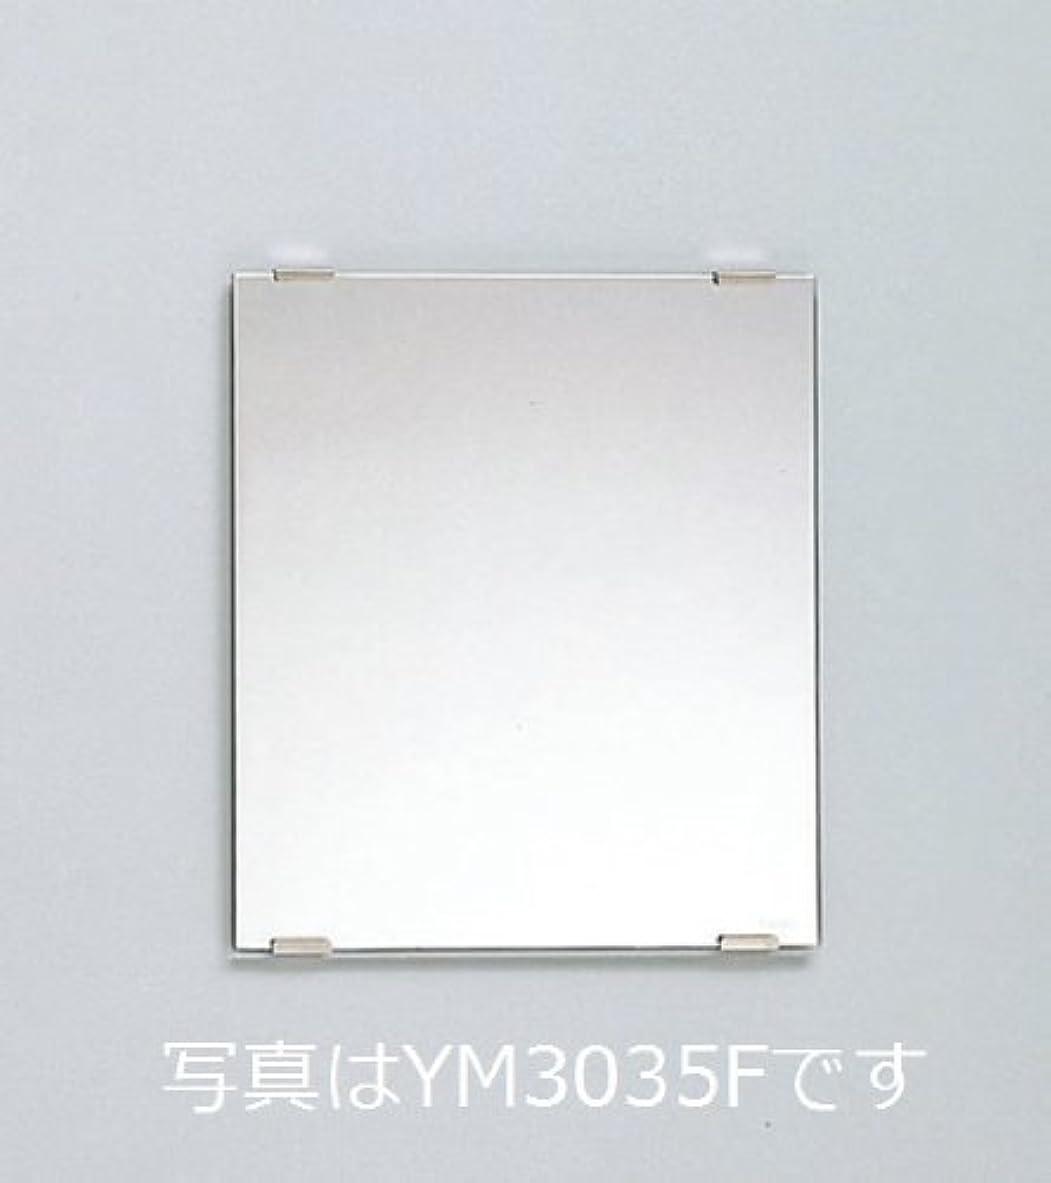 天文学包帯ラケットTOTO 化粧鏡 YM3560F 耐食鏡 角型 350×600(mm)